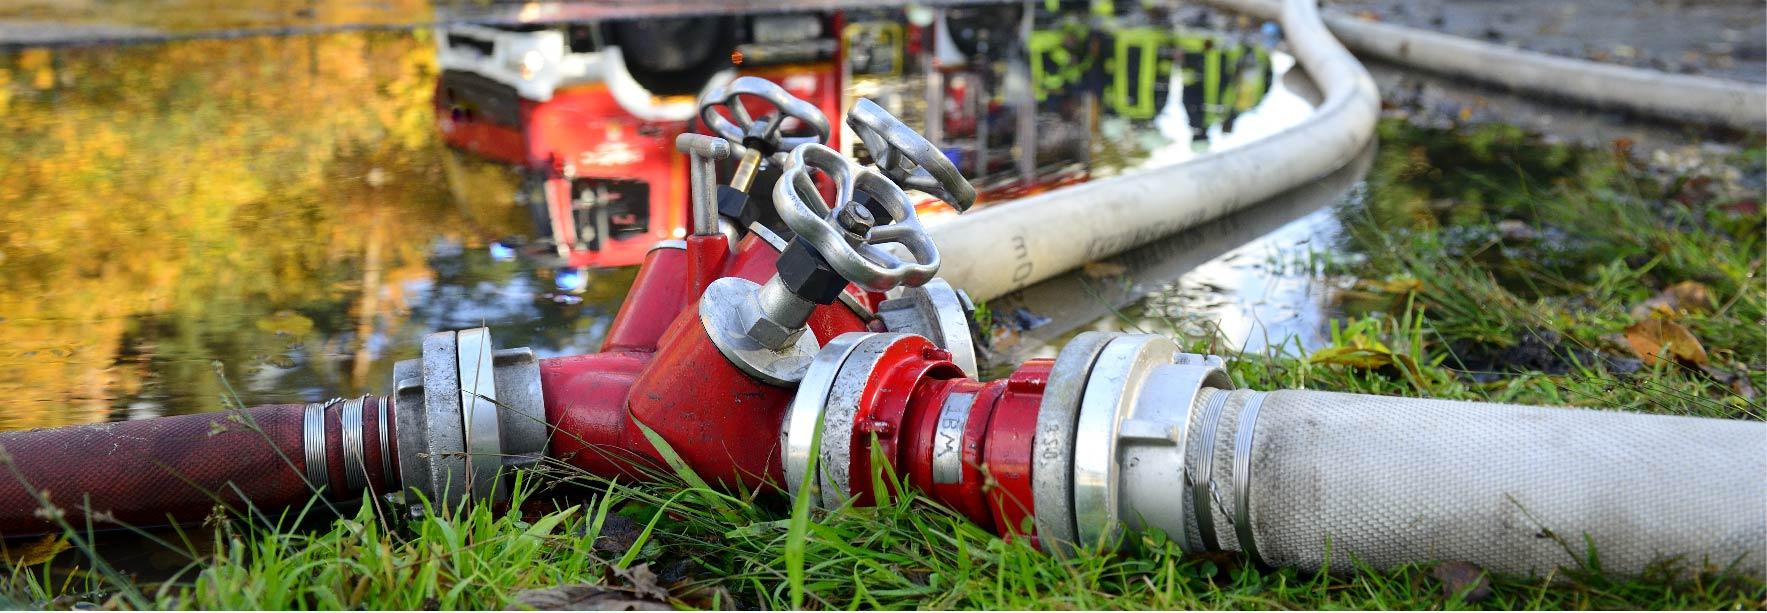 Feuerwehrbedarf